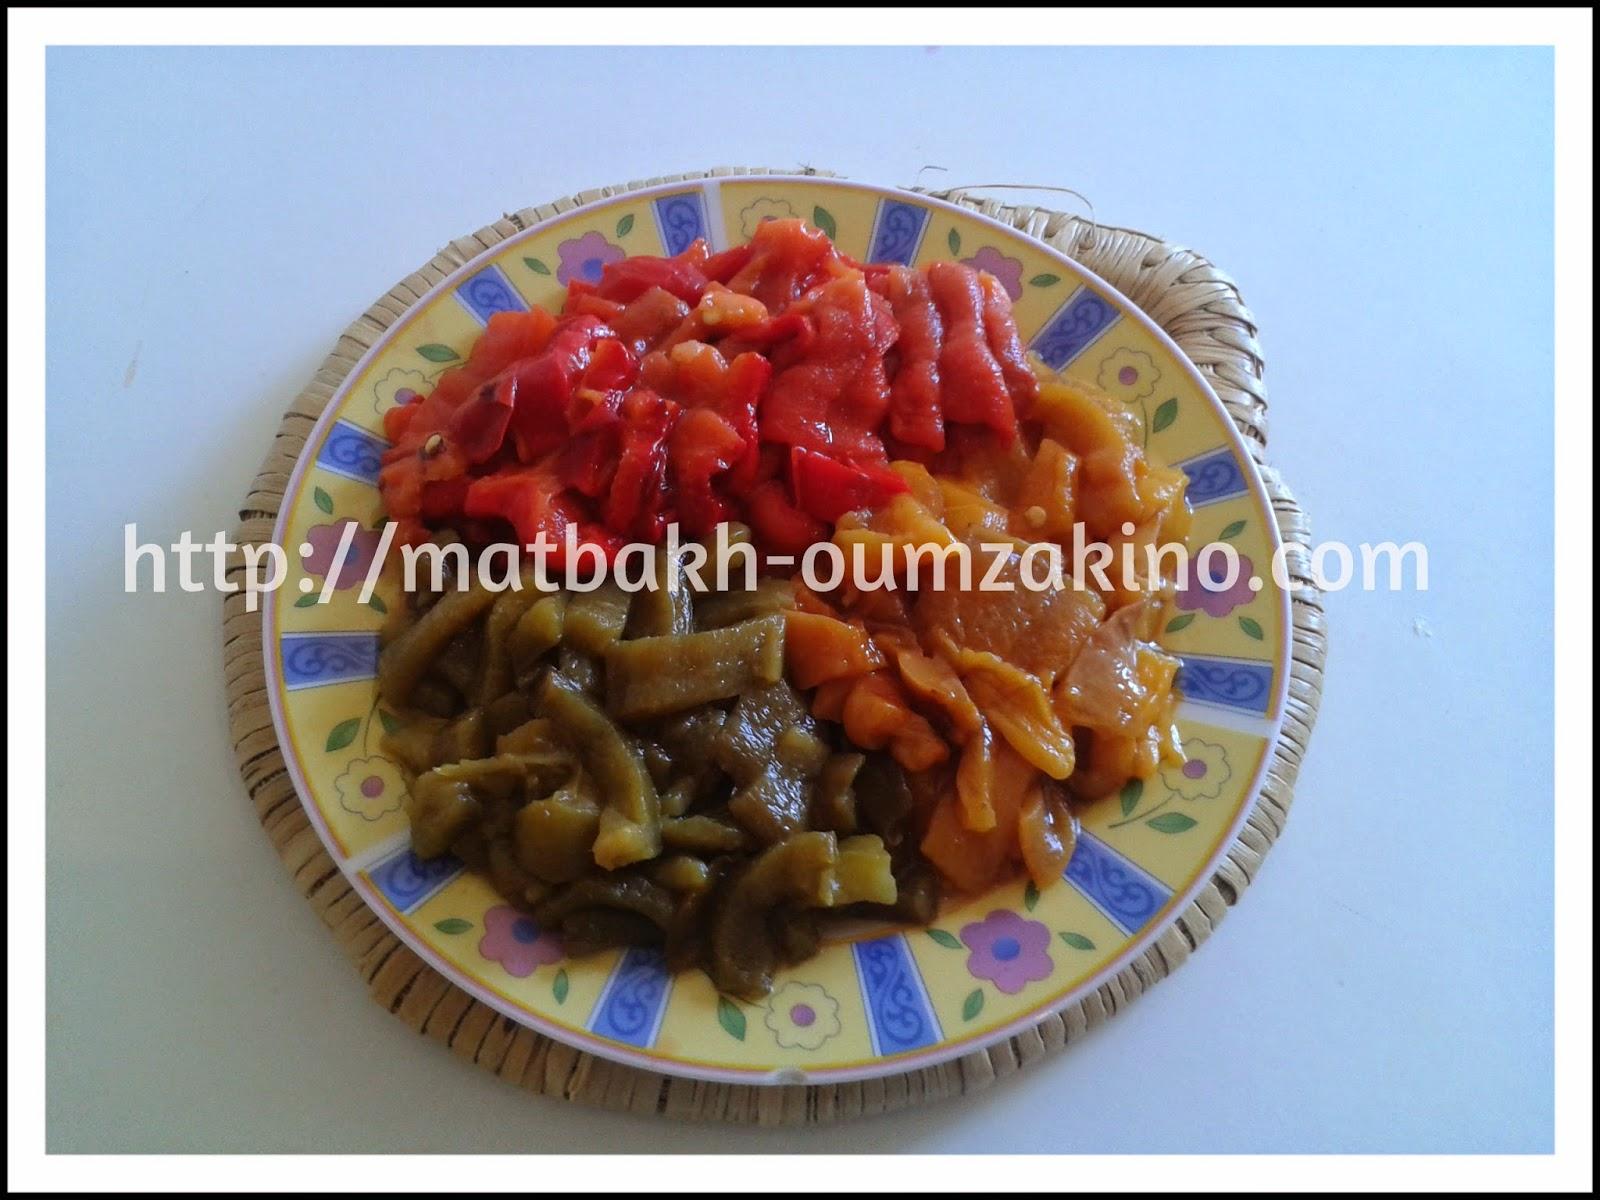 salade marocainne trois poivrons matbakh oumzakino